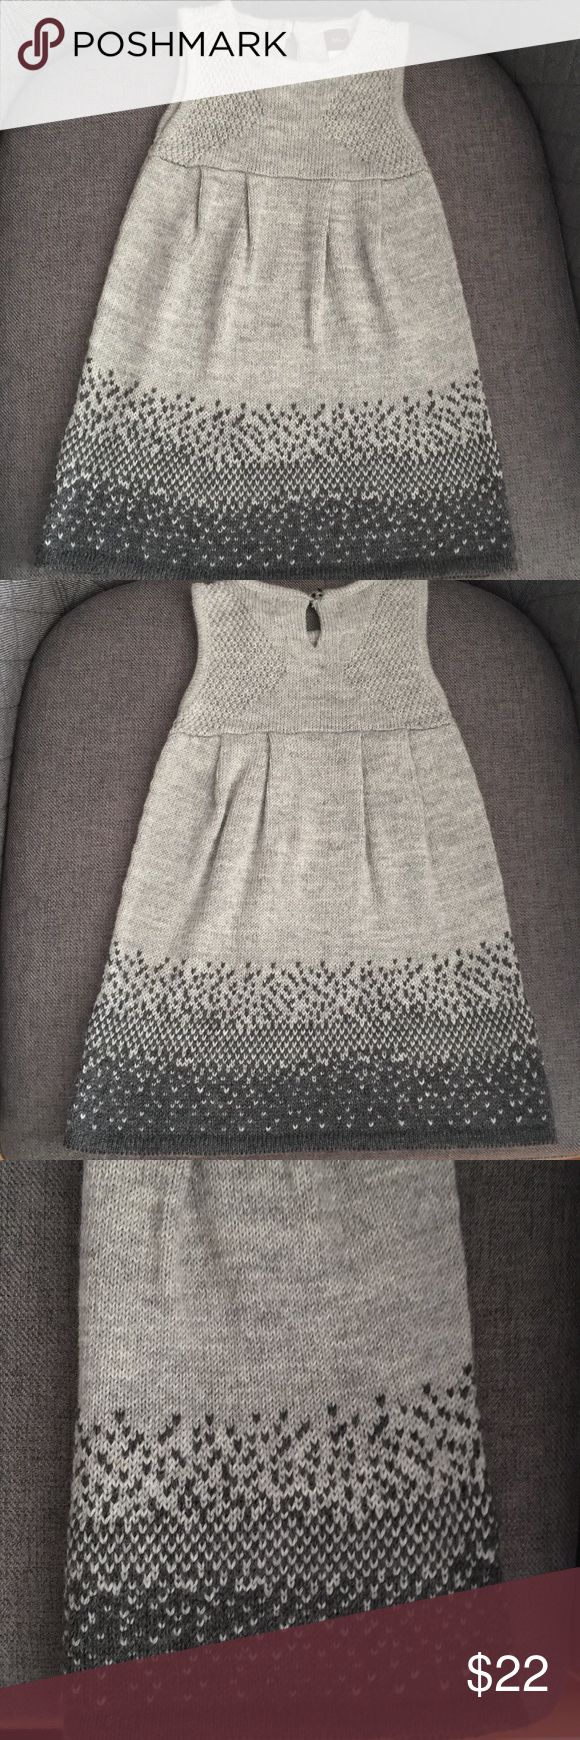 Tea Collection Sleeveless Dress Gray sleeveless sweater dress Tea Collection Dresses Casual